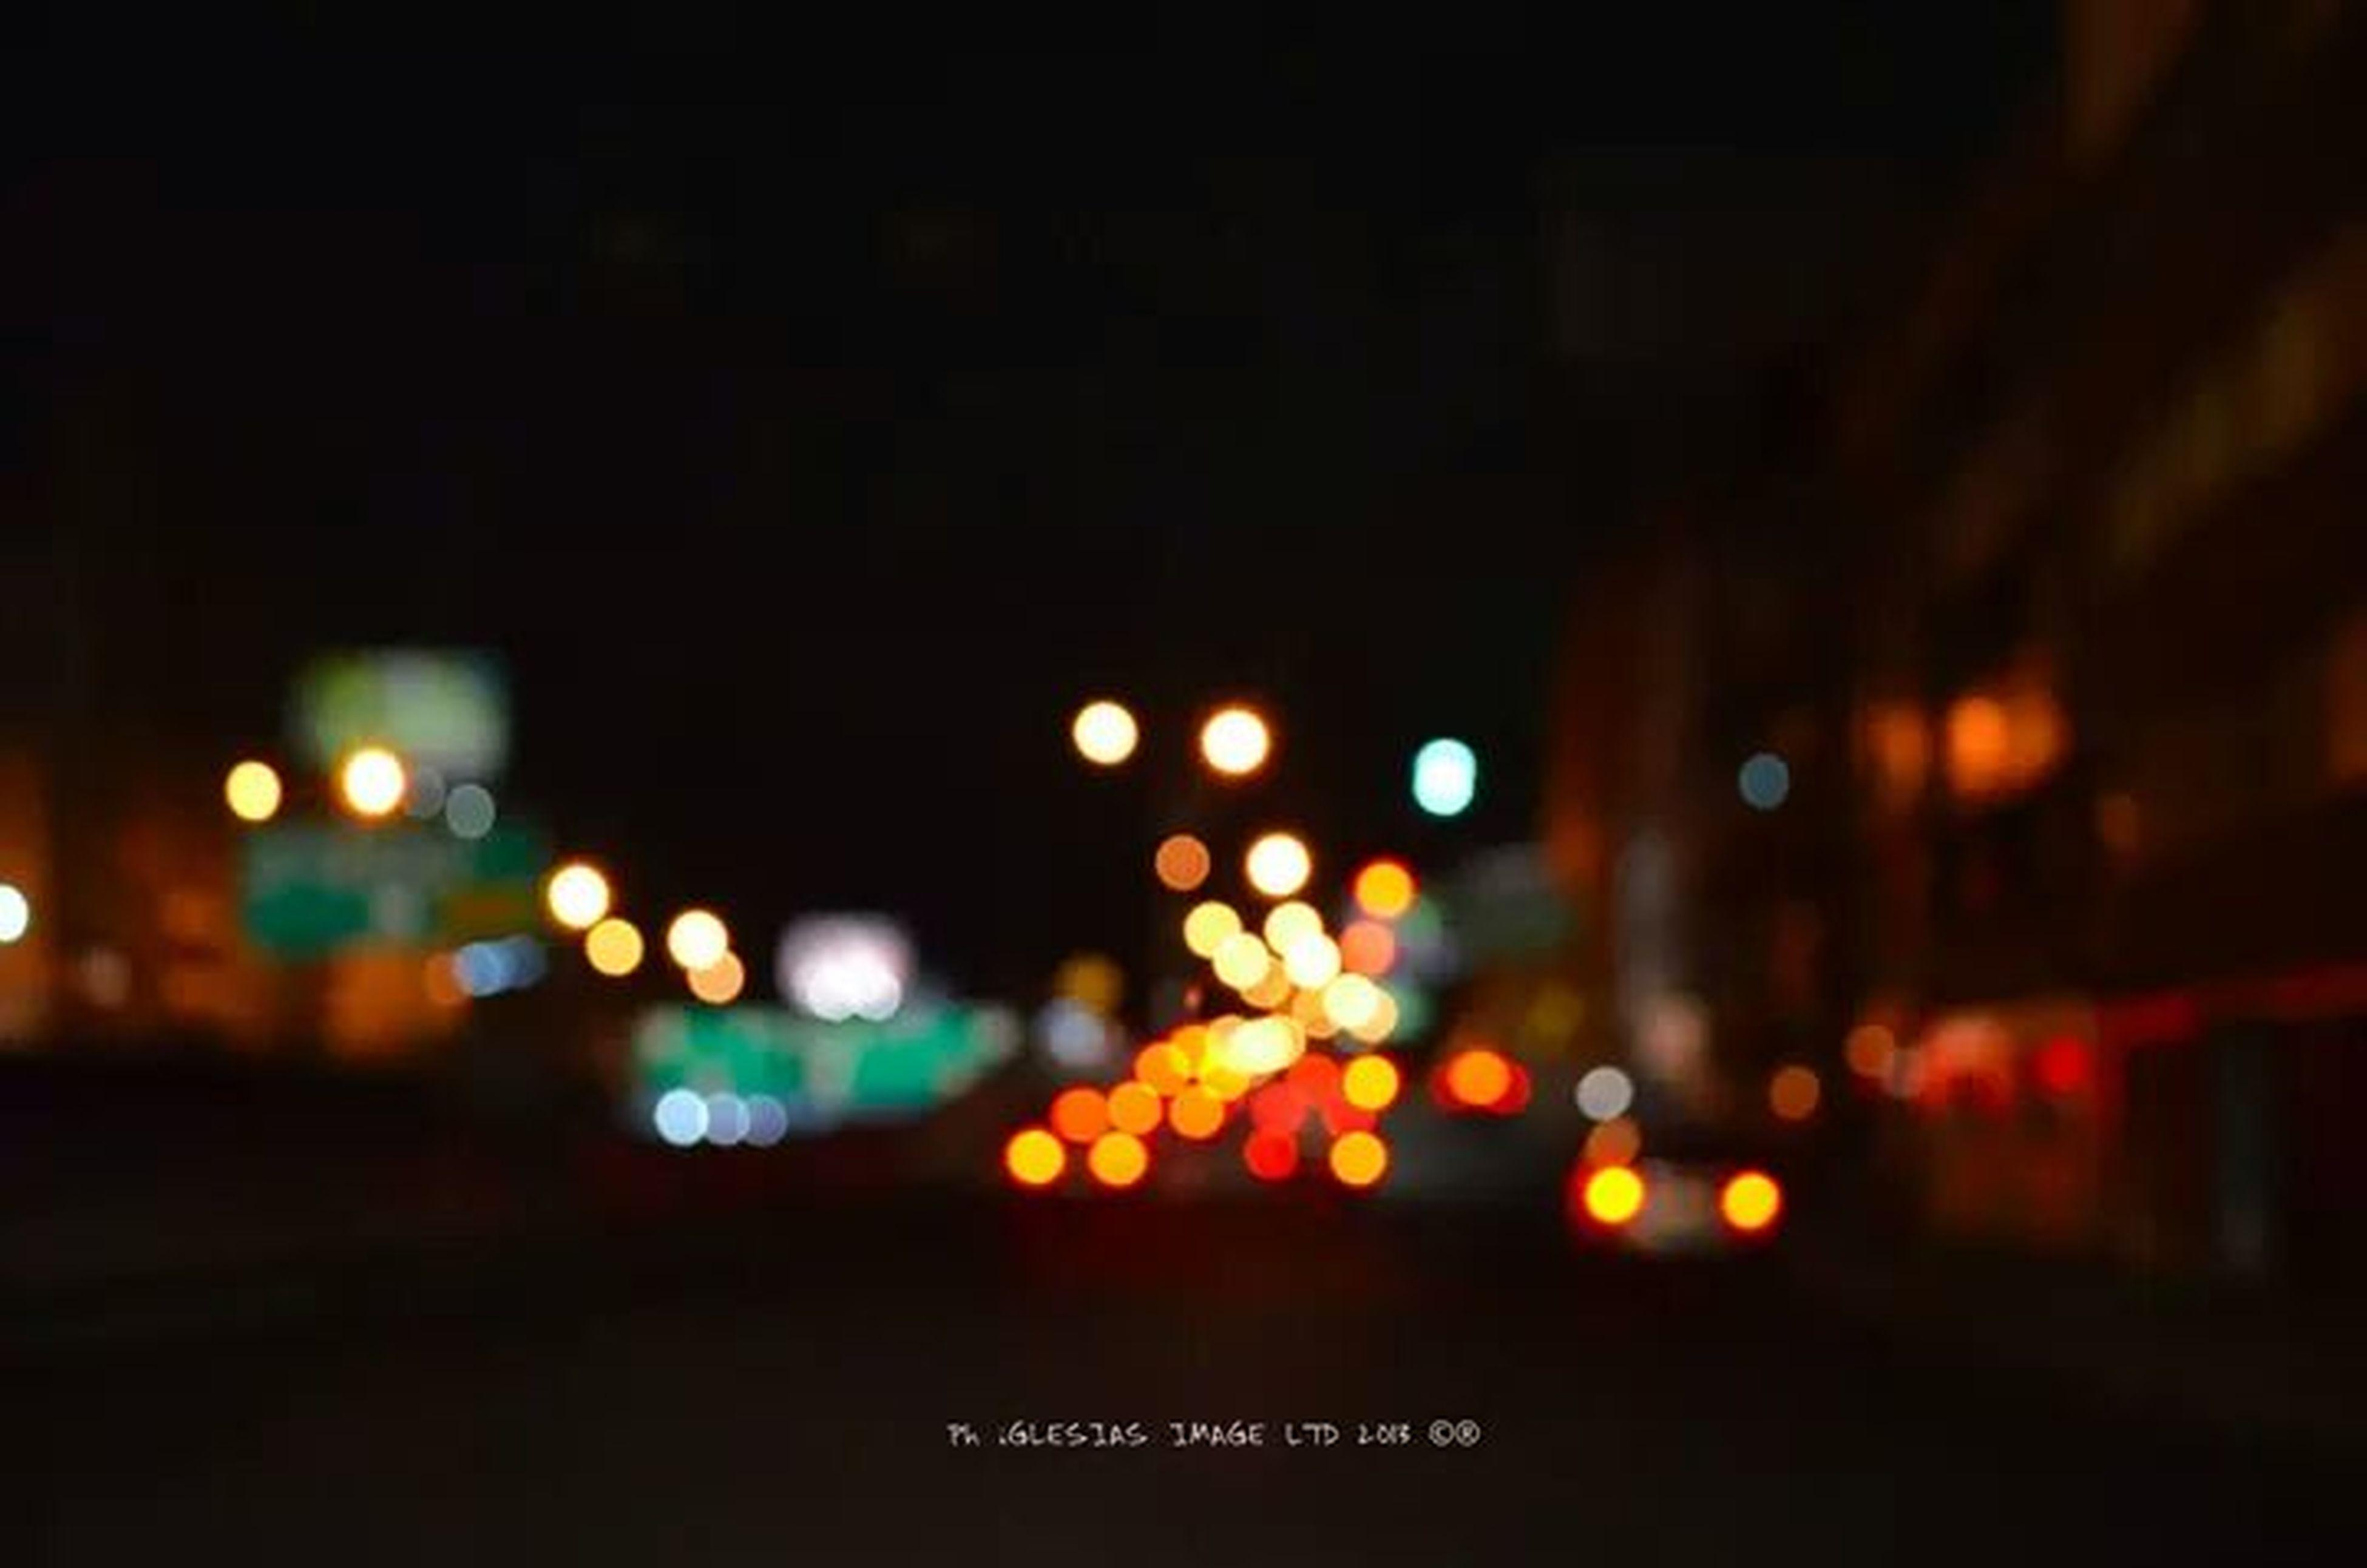 illuminated, night, defocused, city, lighting equipment, light - natural phenomenon, building exterior, street, transportation, street light, no people, dark, built structure, architecture, road, outdoors, city life, car, glowing, sky